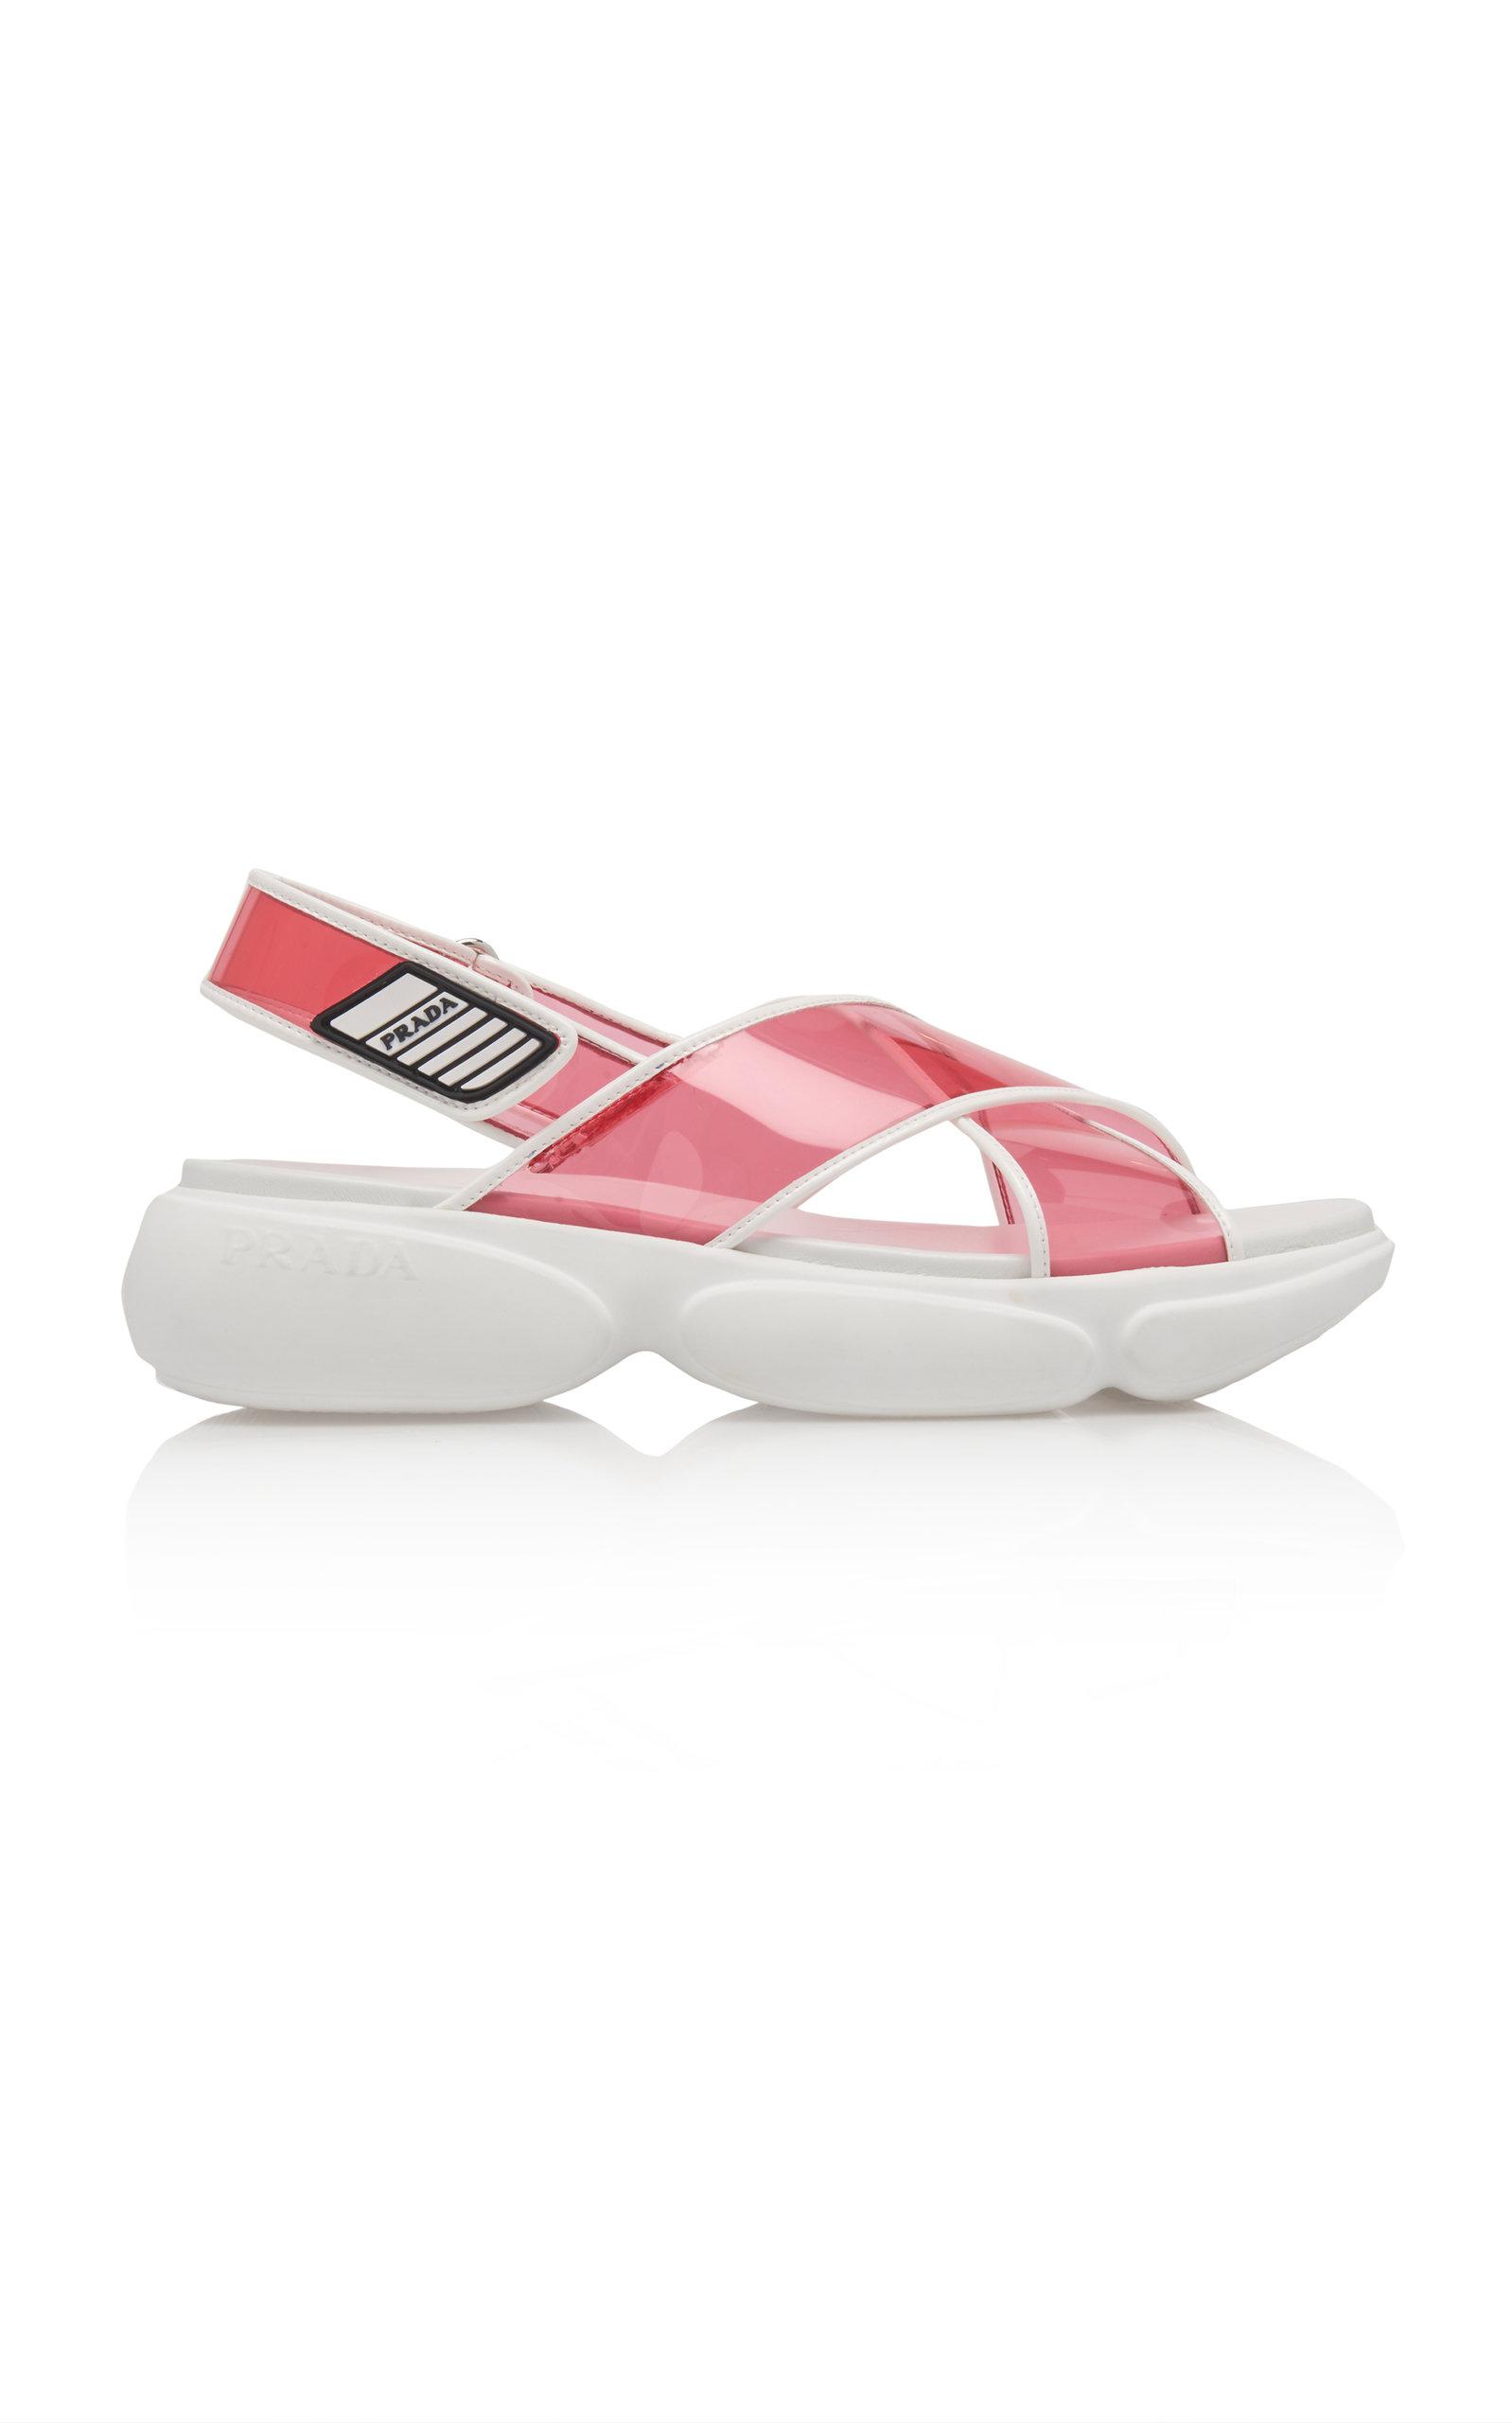 Prada Prada PVC Strappy Sandals from